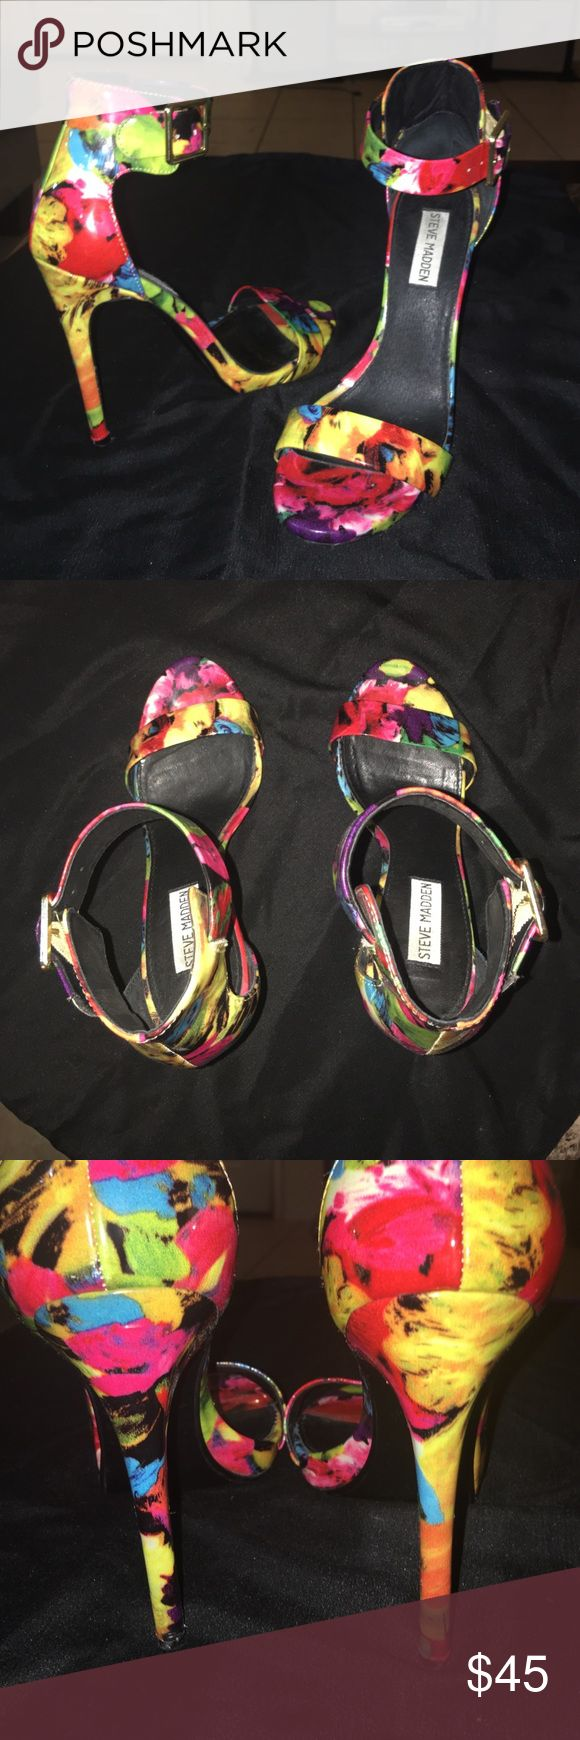 Steve Madden. Vibrant floral strappy Heels Barely worn floral Heels.  Size 9 Steve Madden Shoes Heels